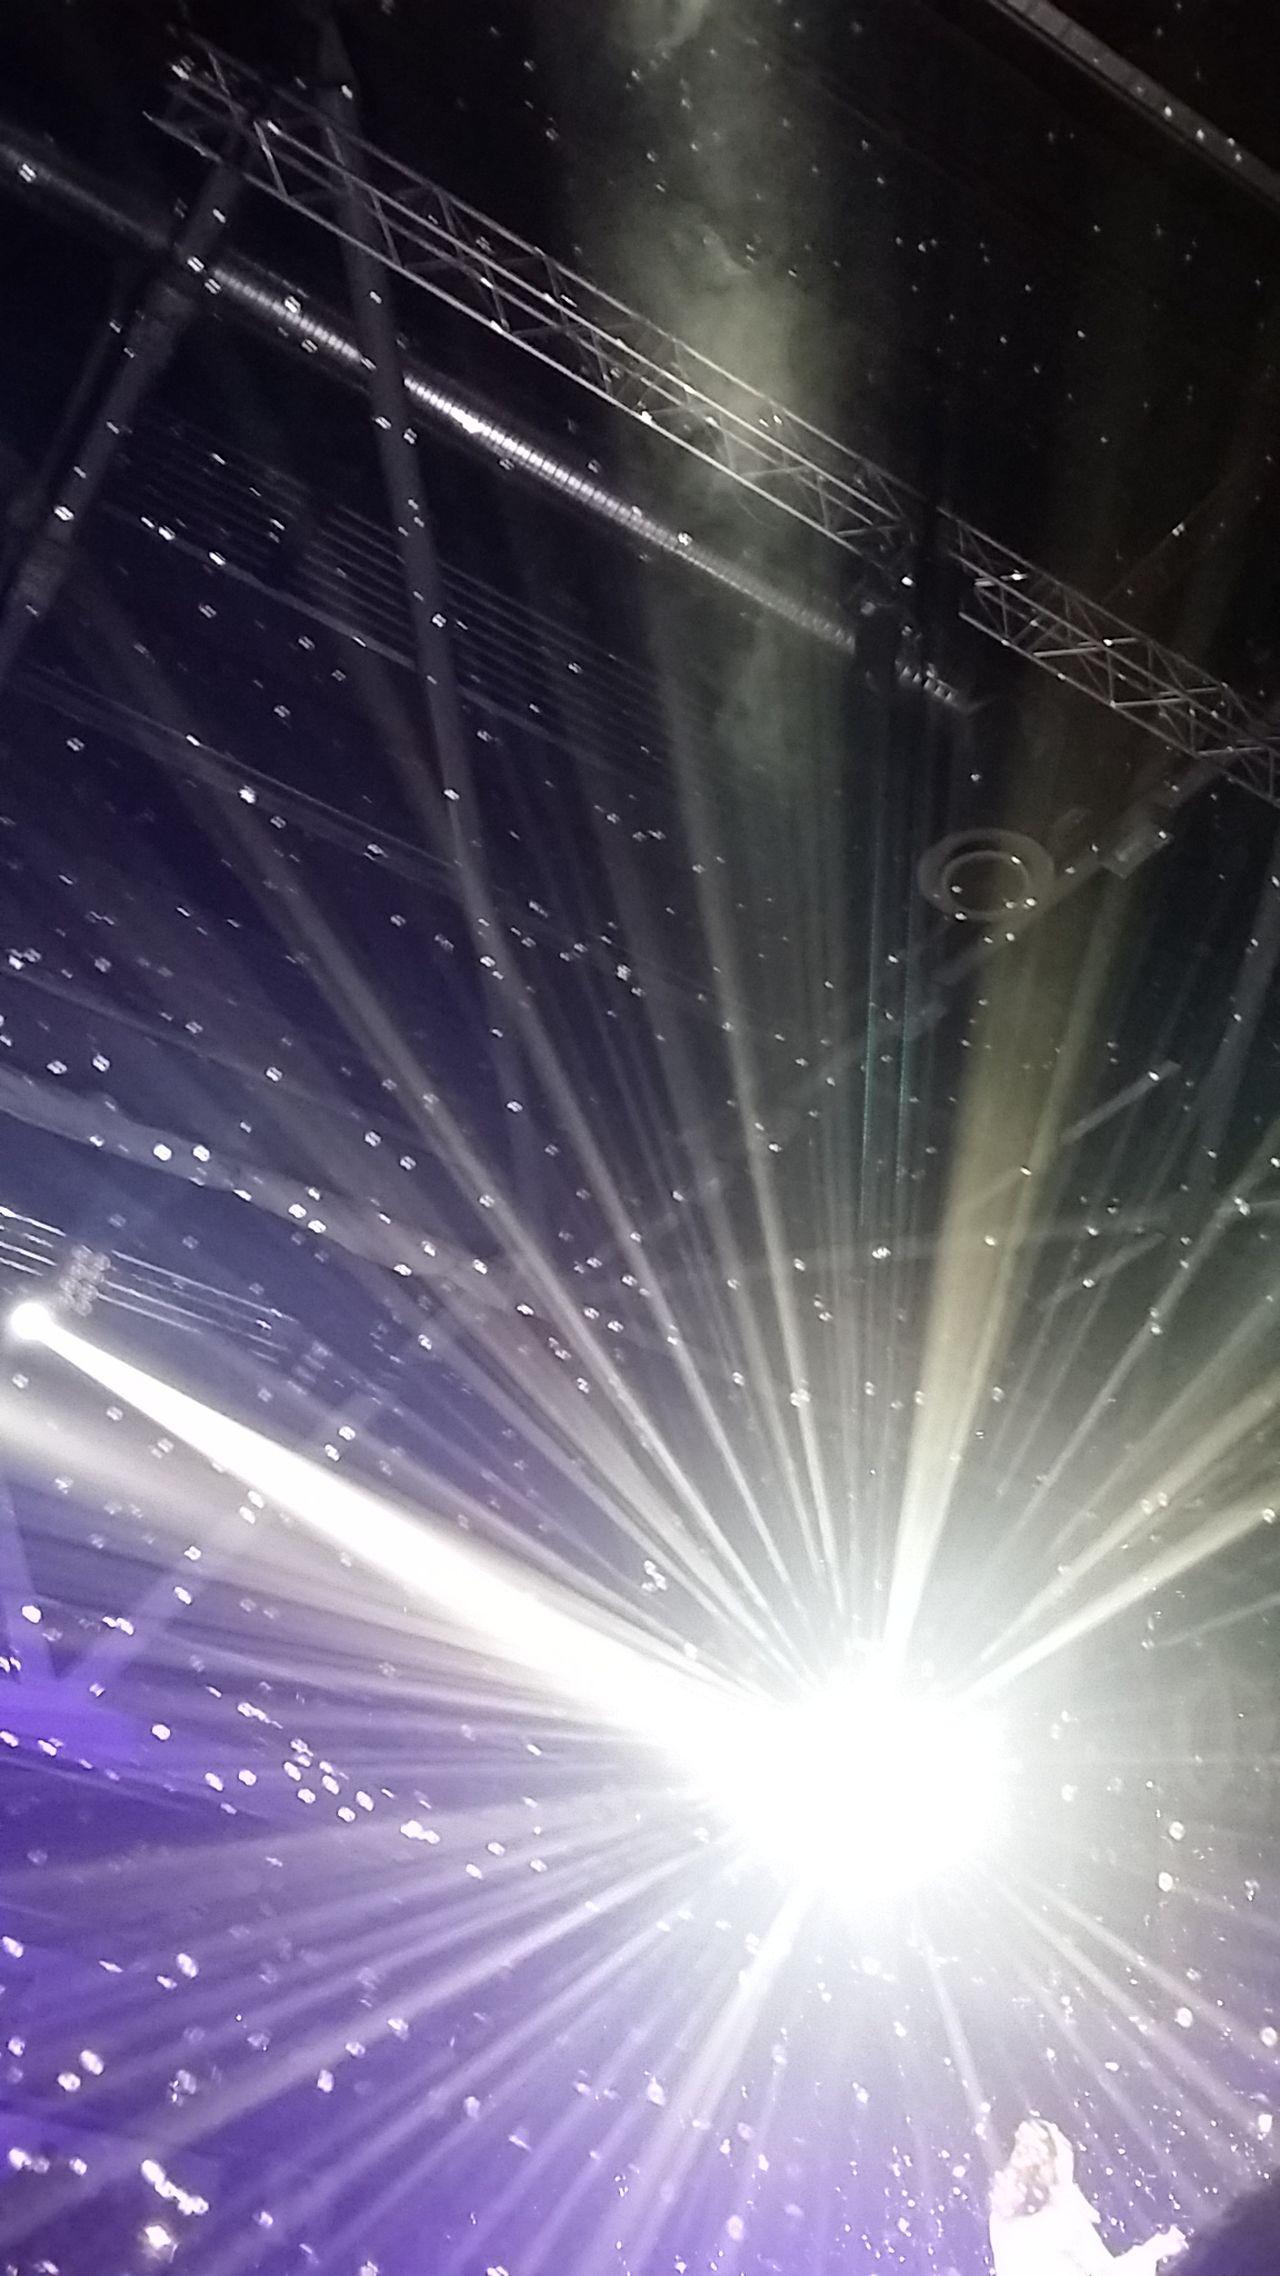 Backgrounds Lights Lighting Equipment Love To Take Photos ❤ Popu!ar Photos Showcase: November In Concert Happy Beliebte Fotos EyeEm Best Shots Open Edit Funny Time  Have Fun EyeEm Moments Of Life Momentaufnahmen Lightshow Lichtspiele Be Happy Reflection_collection Night Lights Konzert 💖 EyeEm Masterclass Wonderful_places Wonderful Moment